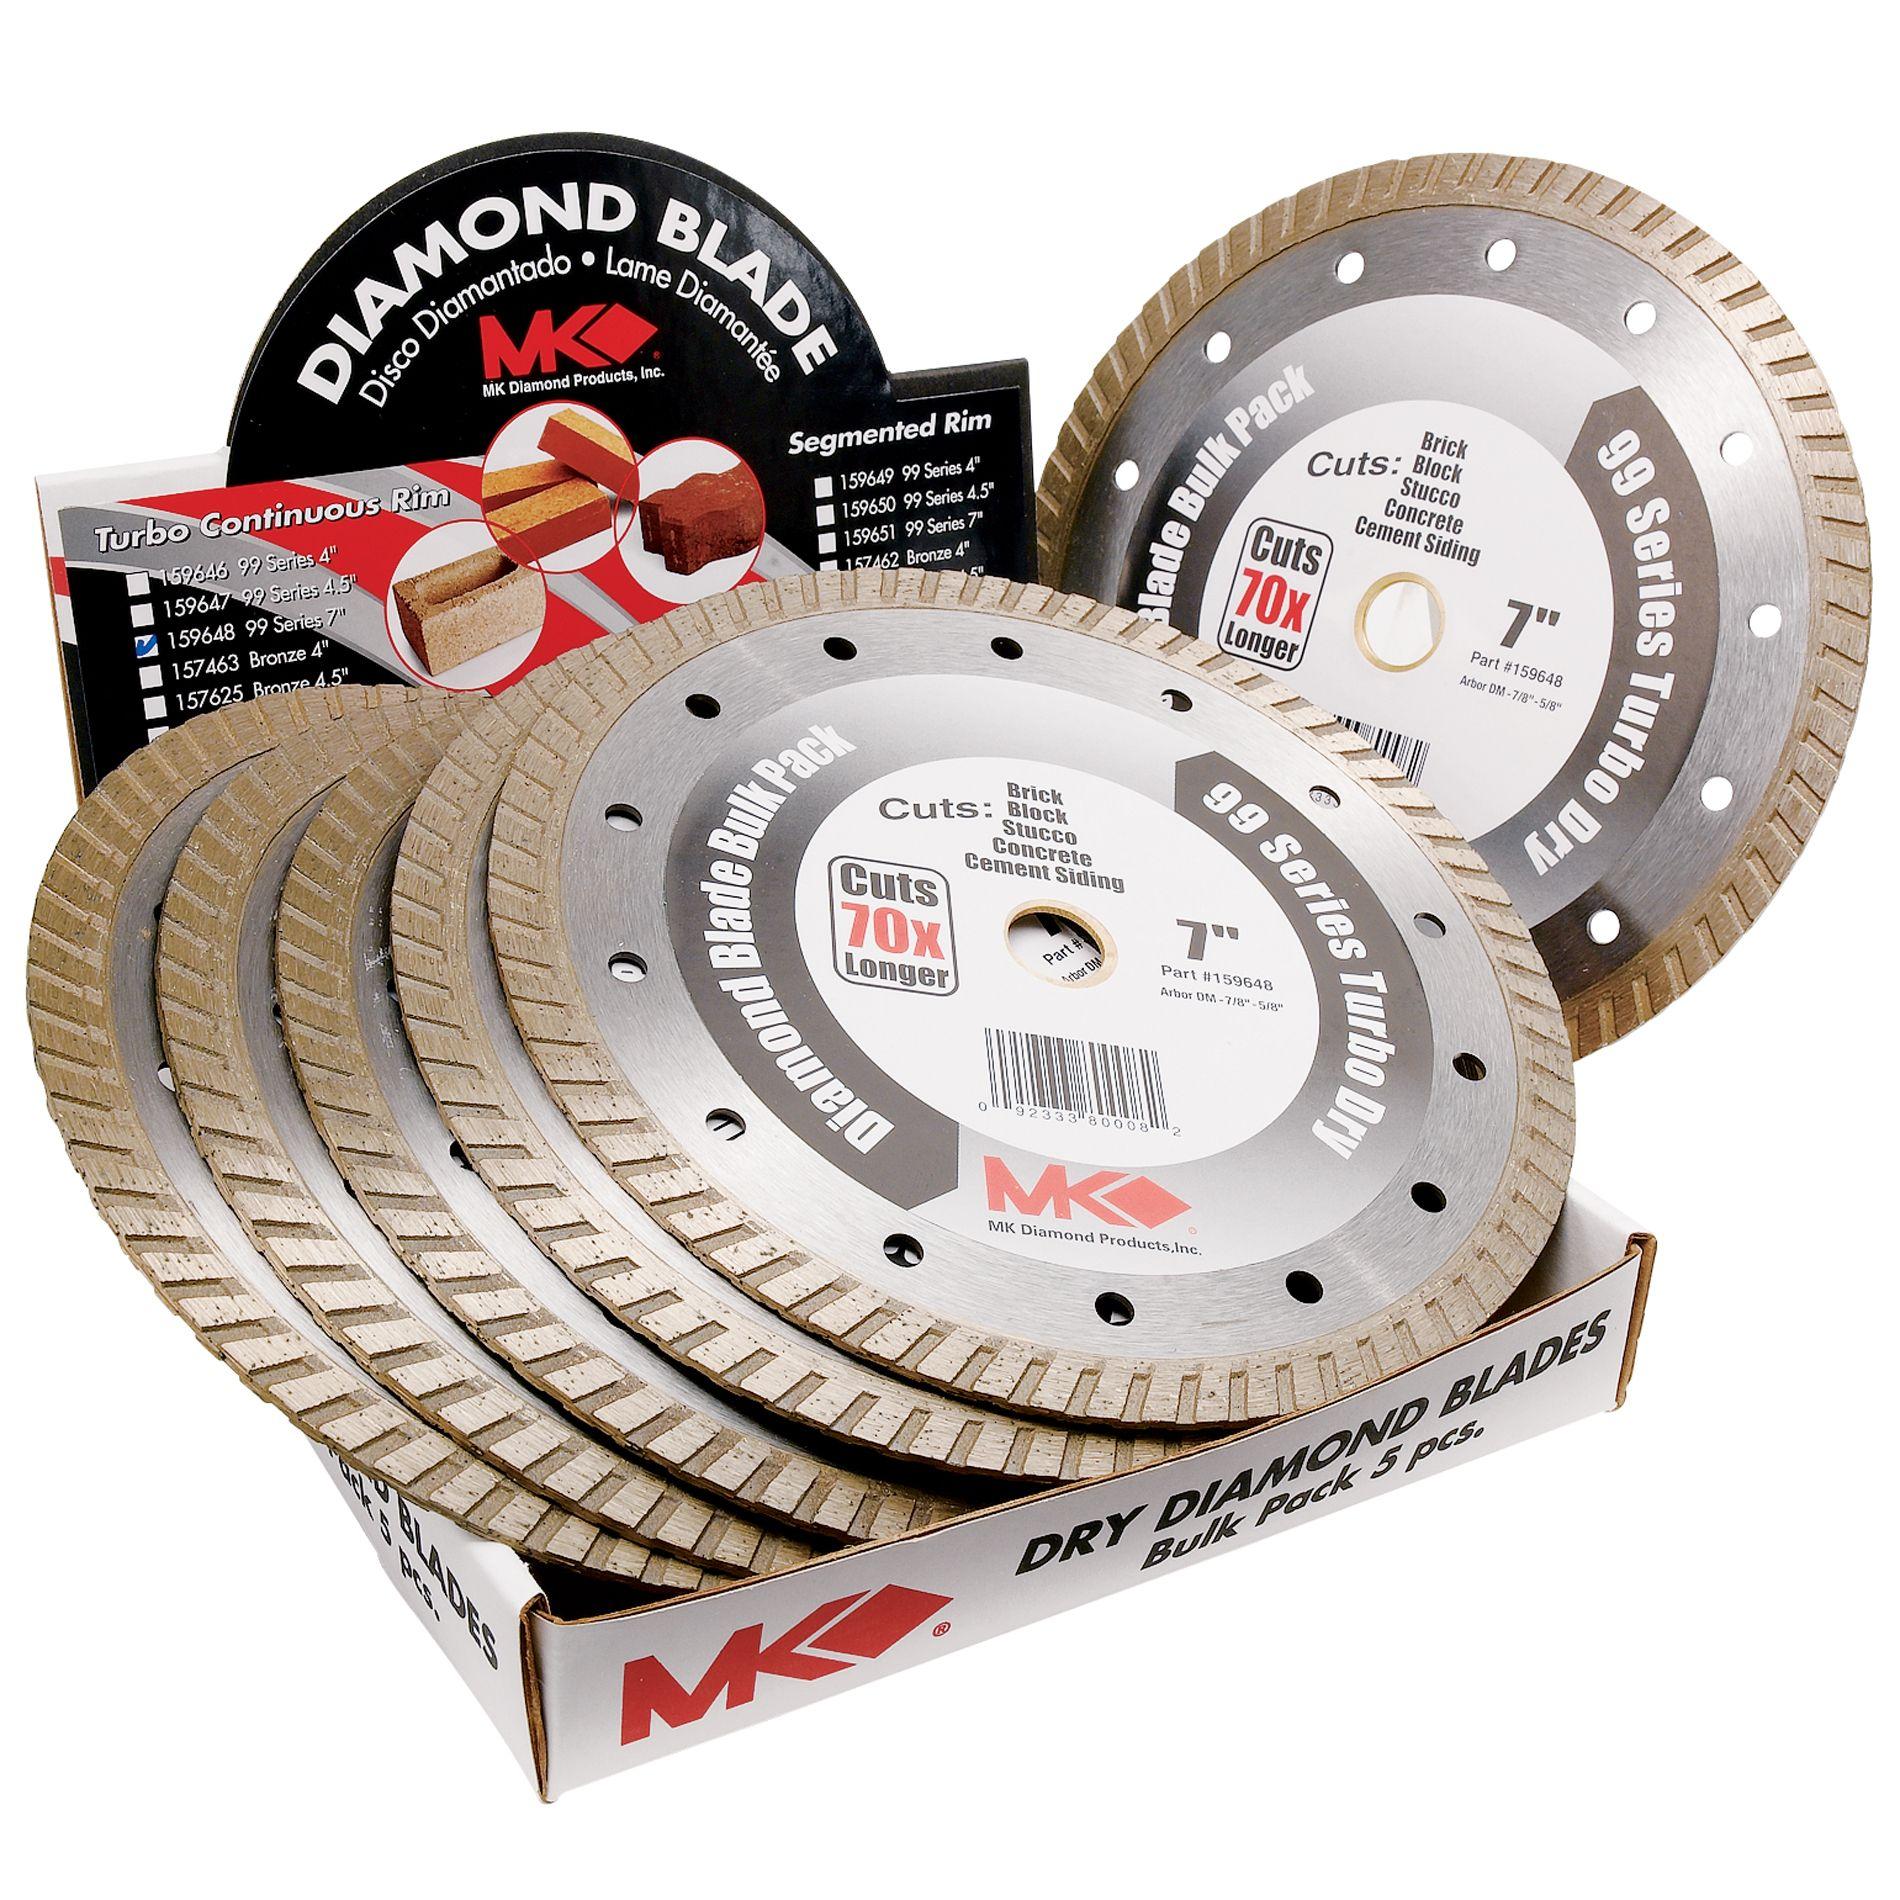 MK Diamond 7 in. Wet/Dry Cutting Turbo Rim Diamond Tile Blades, 6 Pack PartNumber: 00966592000P KsnValue: 65308253 MfgPartNumber: 66592